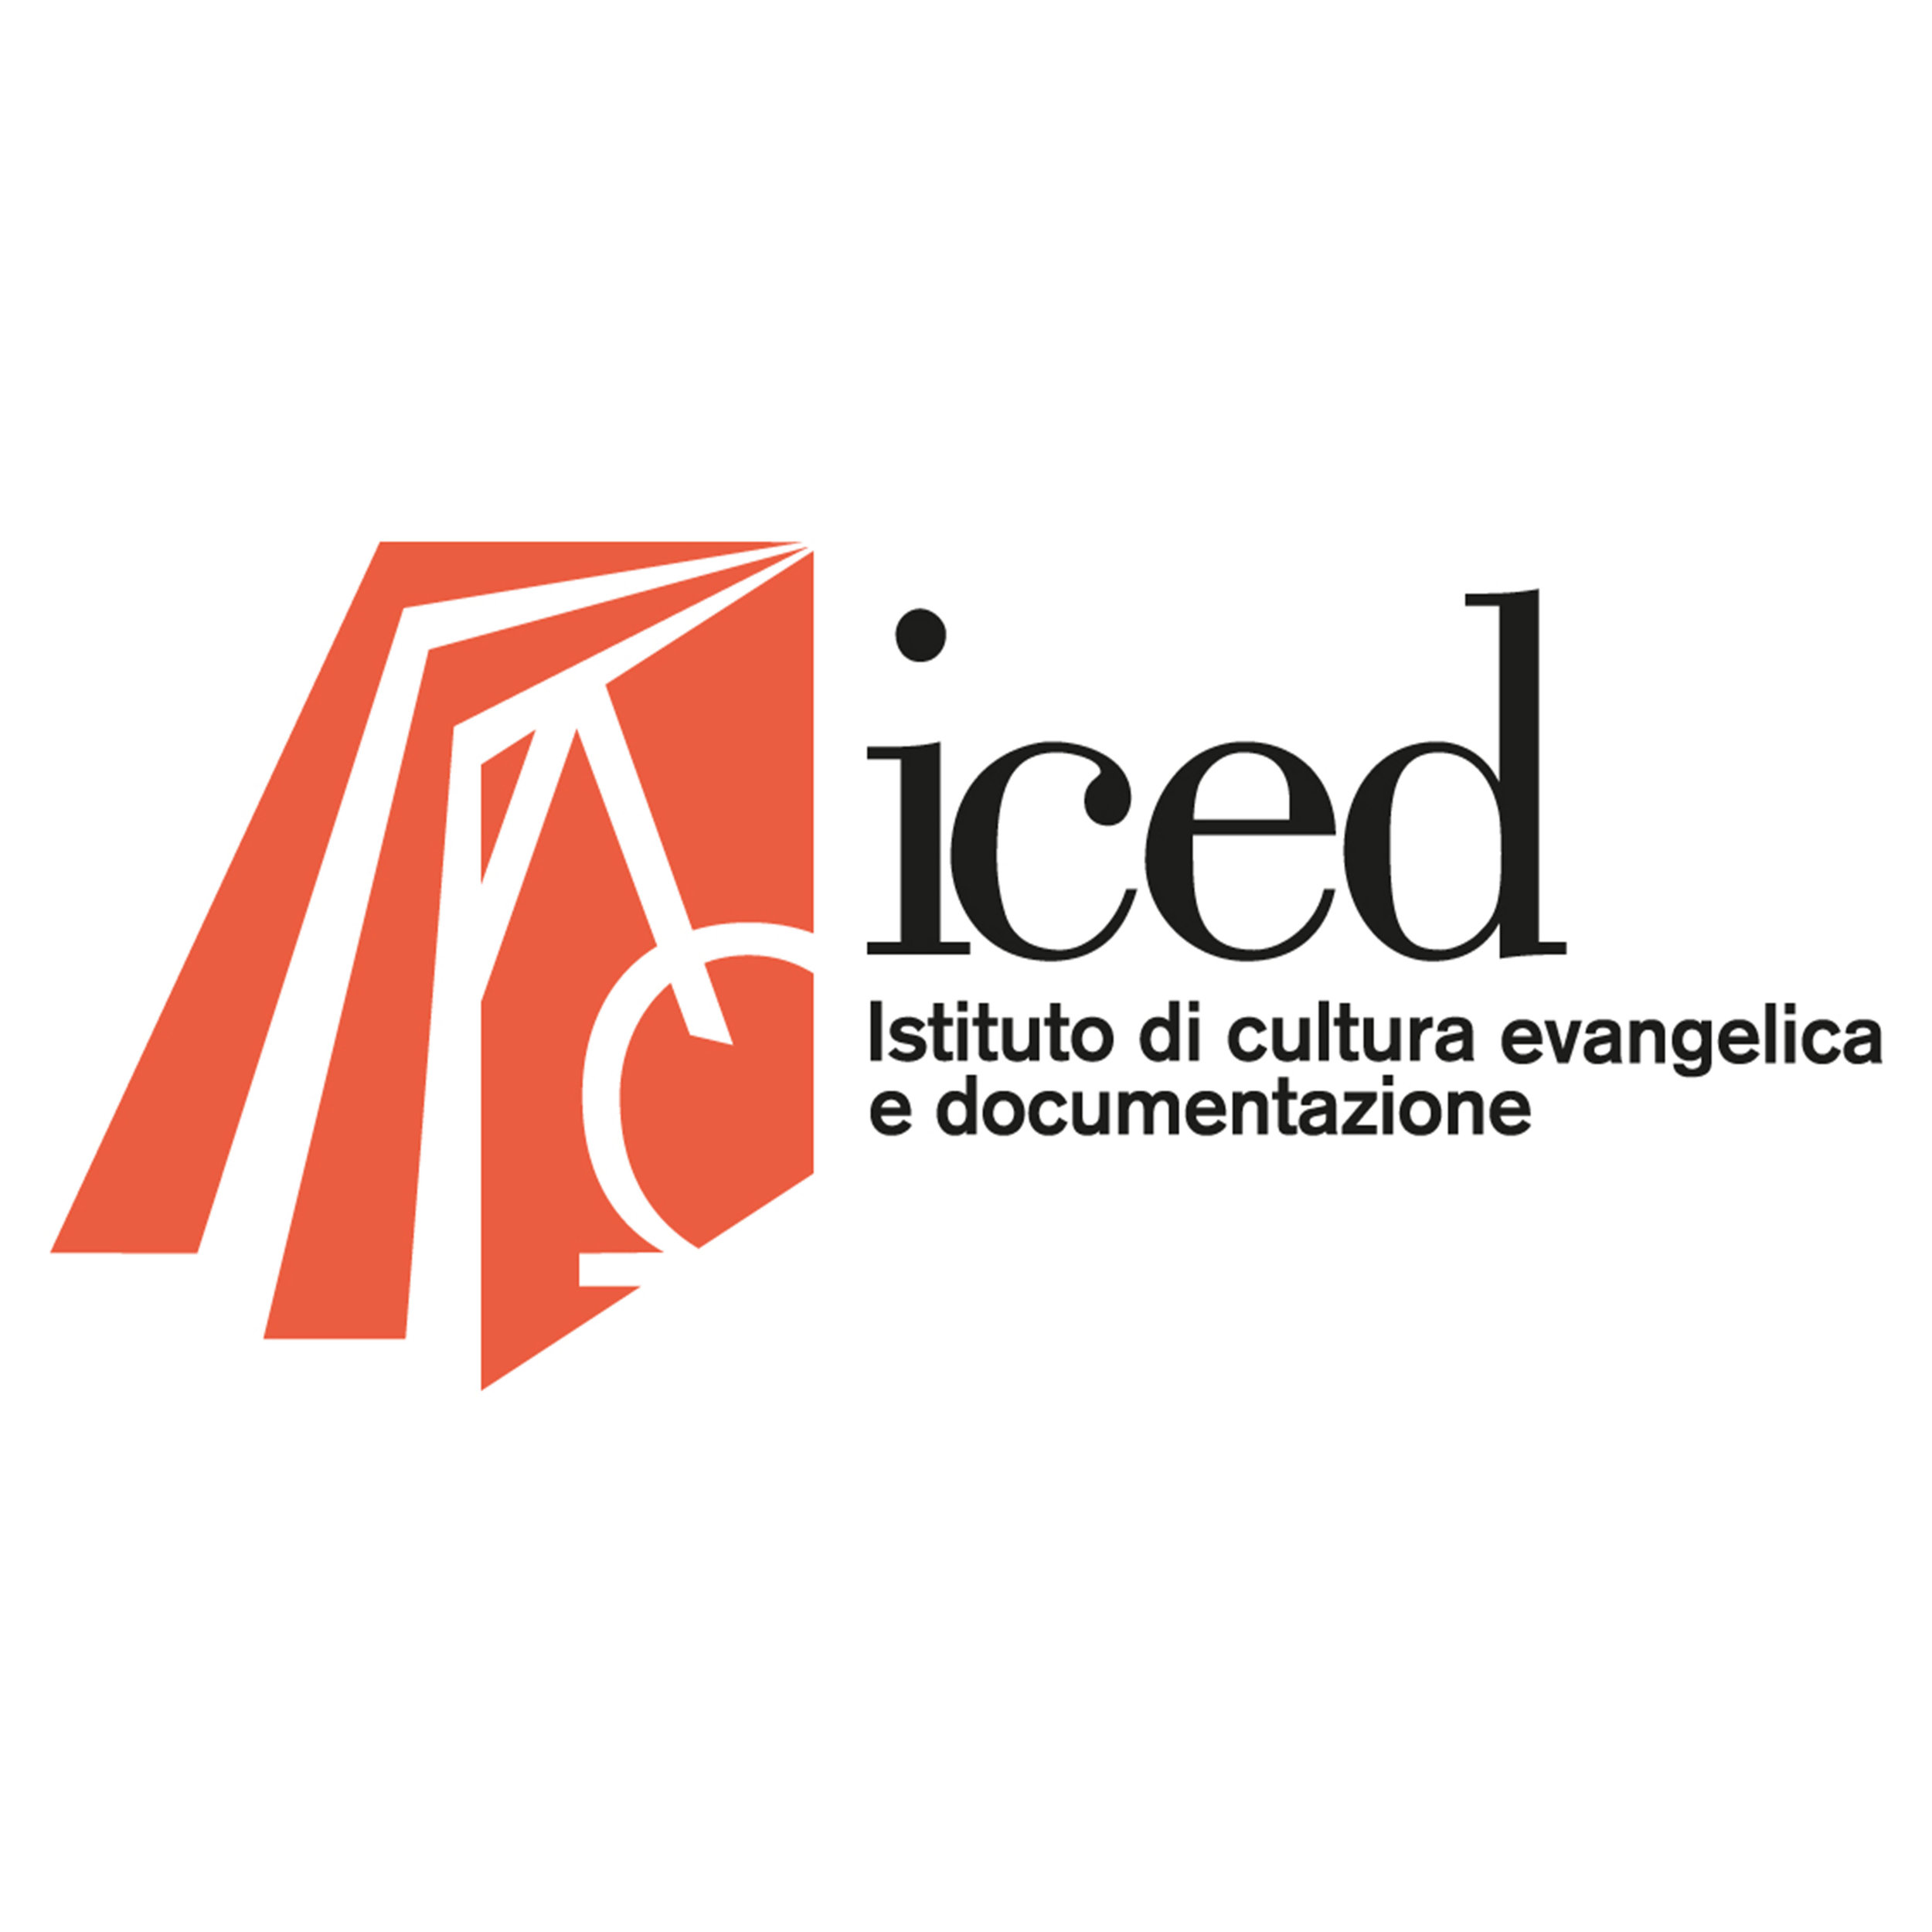 Istituto di Cultura Evangelica e Documentazione